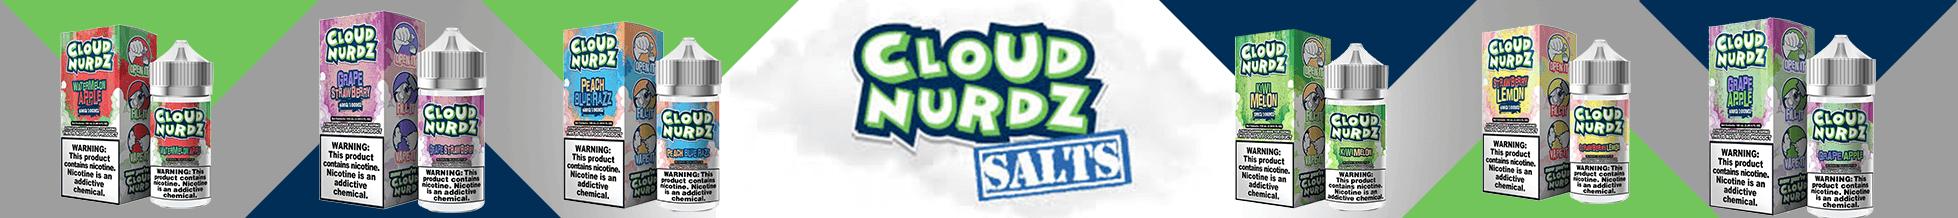 cloud-nurdz-salt.png